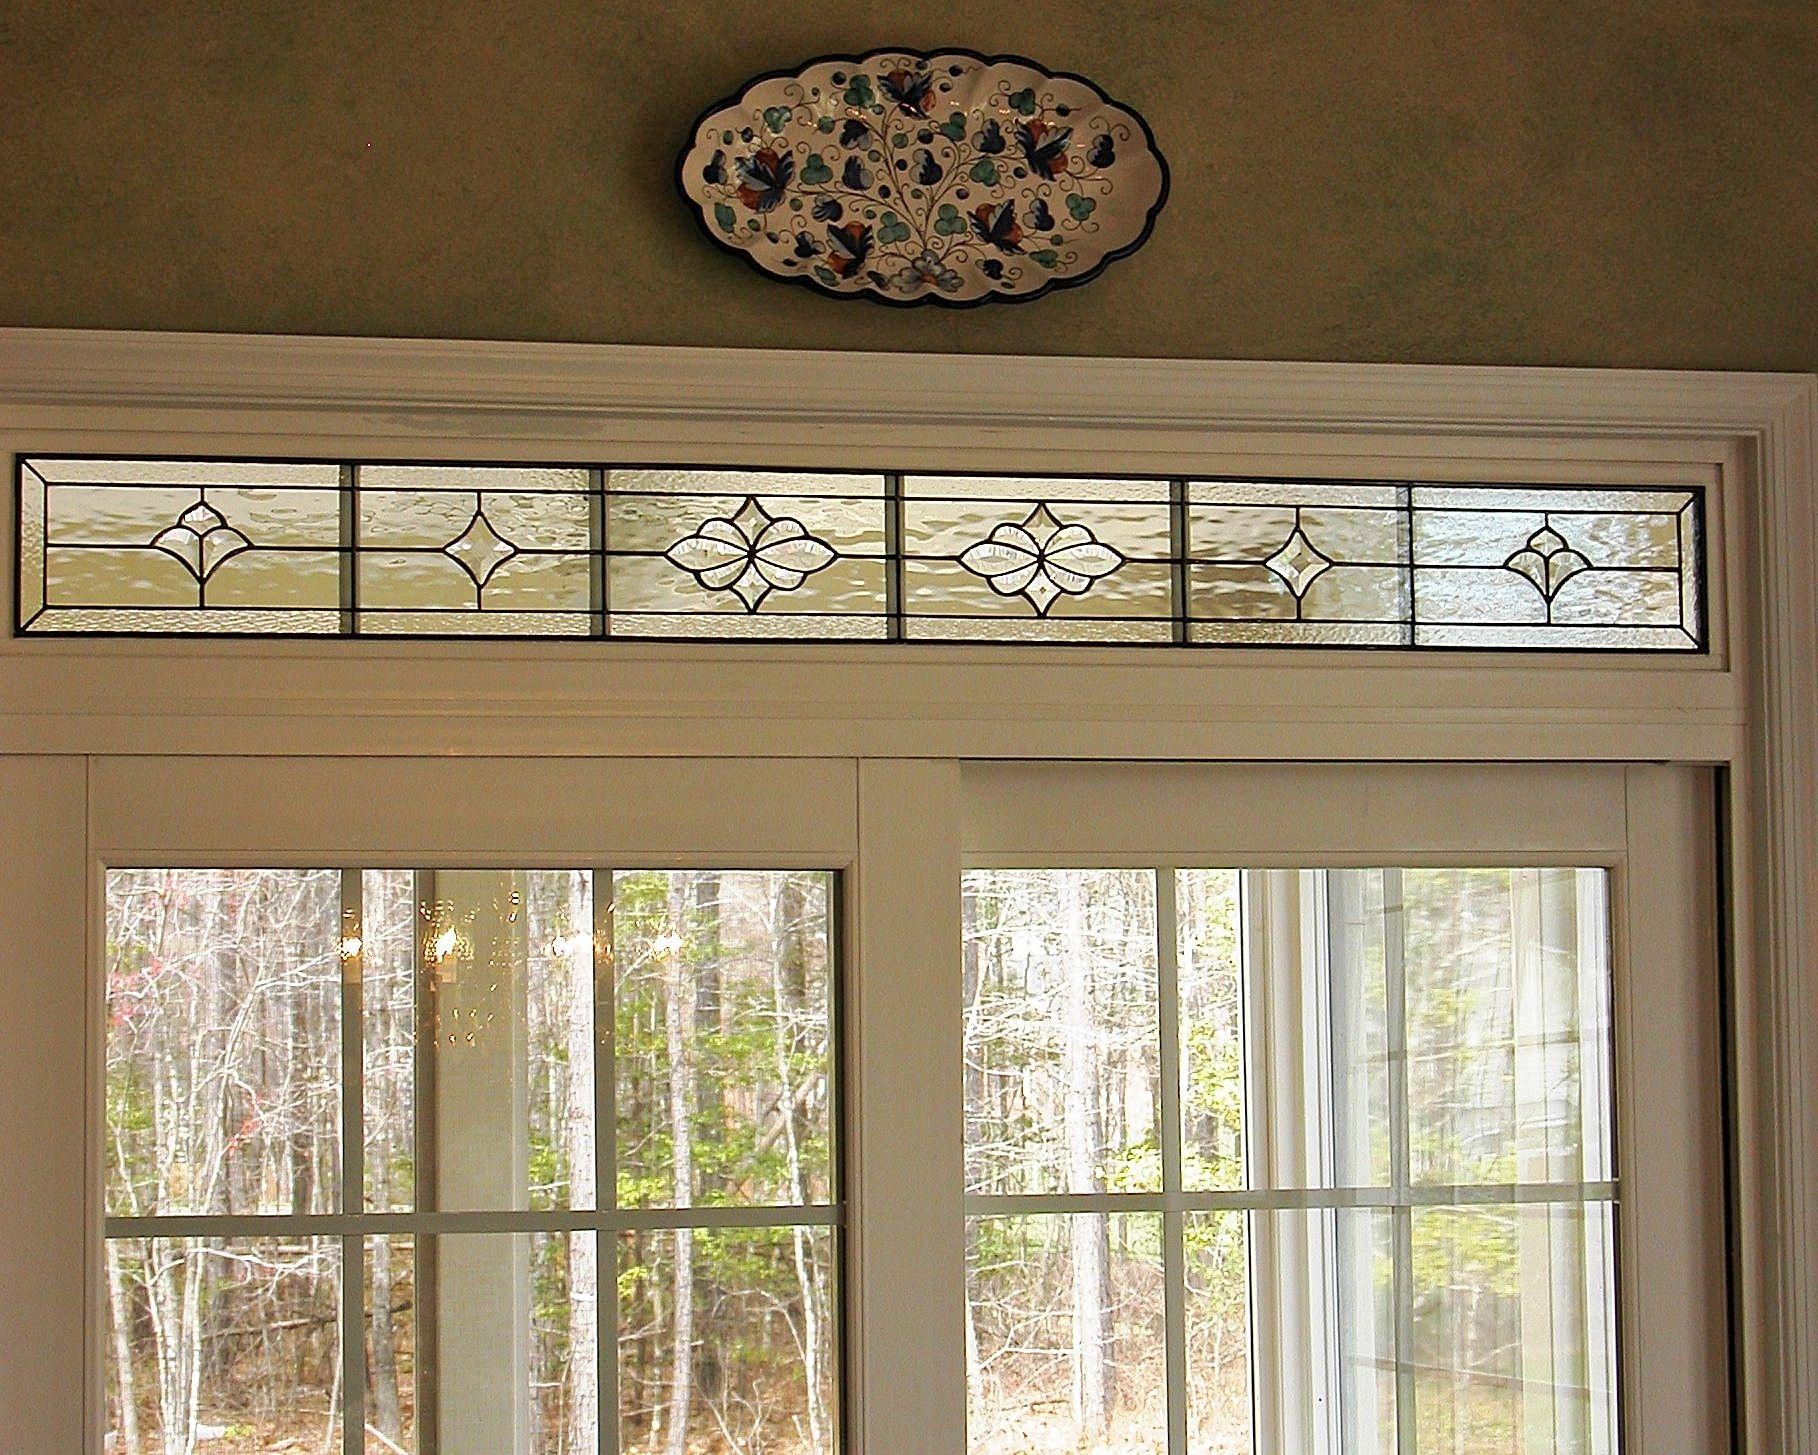 Augst design.  #transom #home decor #artsy #beautiful #custom-made #creative #elegant #window #stained glass